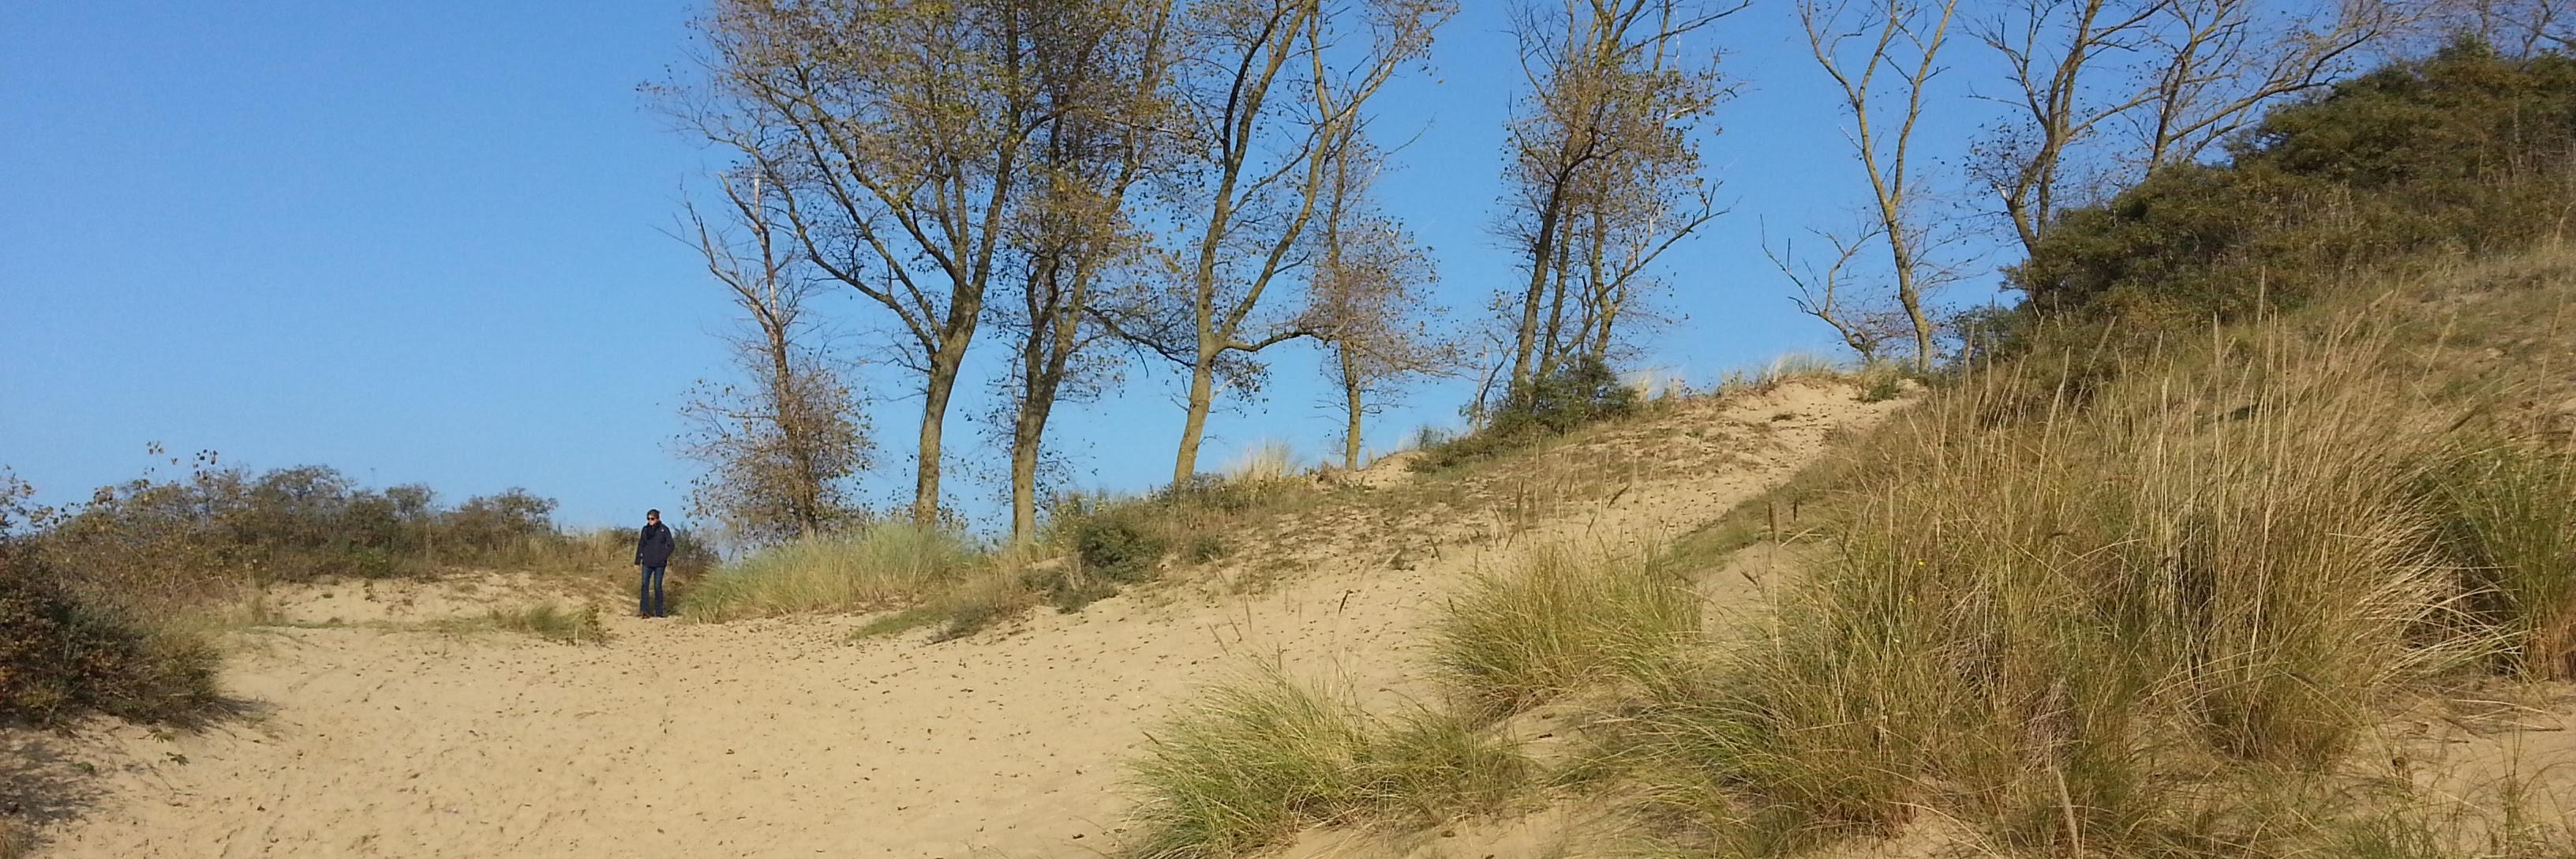 080-premiere-dune